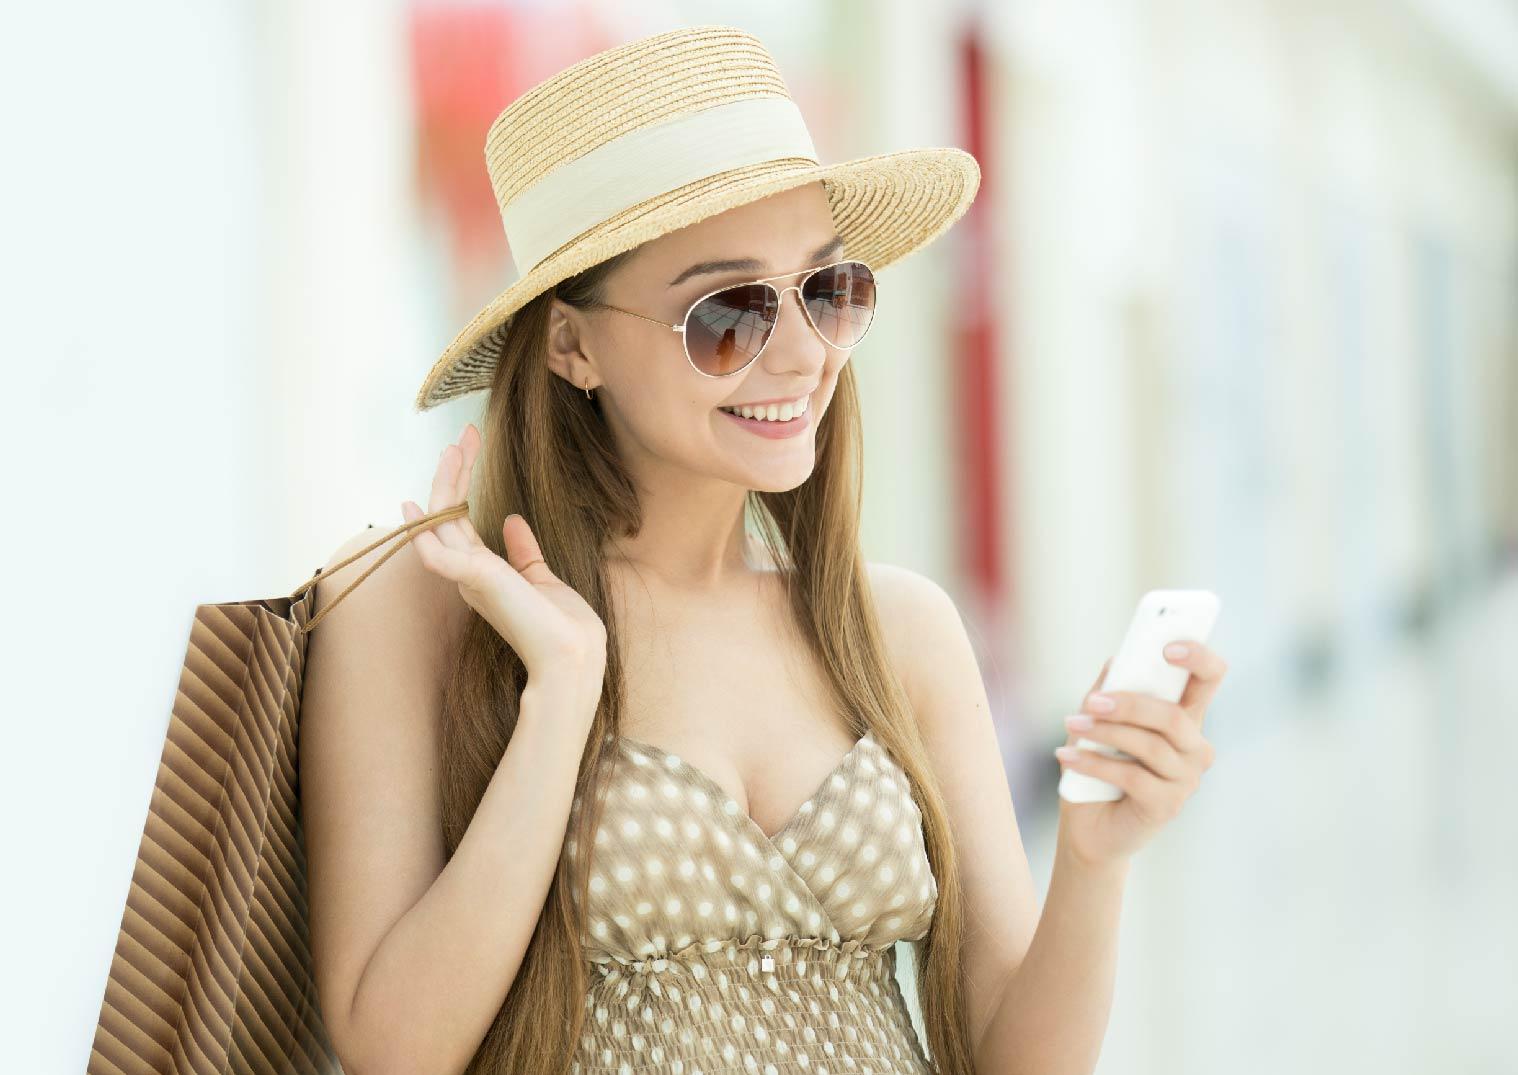 WiFi分享器:美女戴帽子用手機